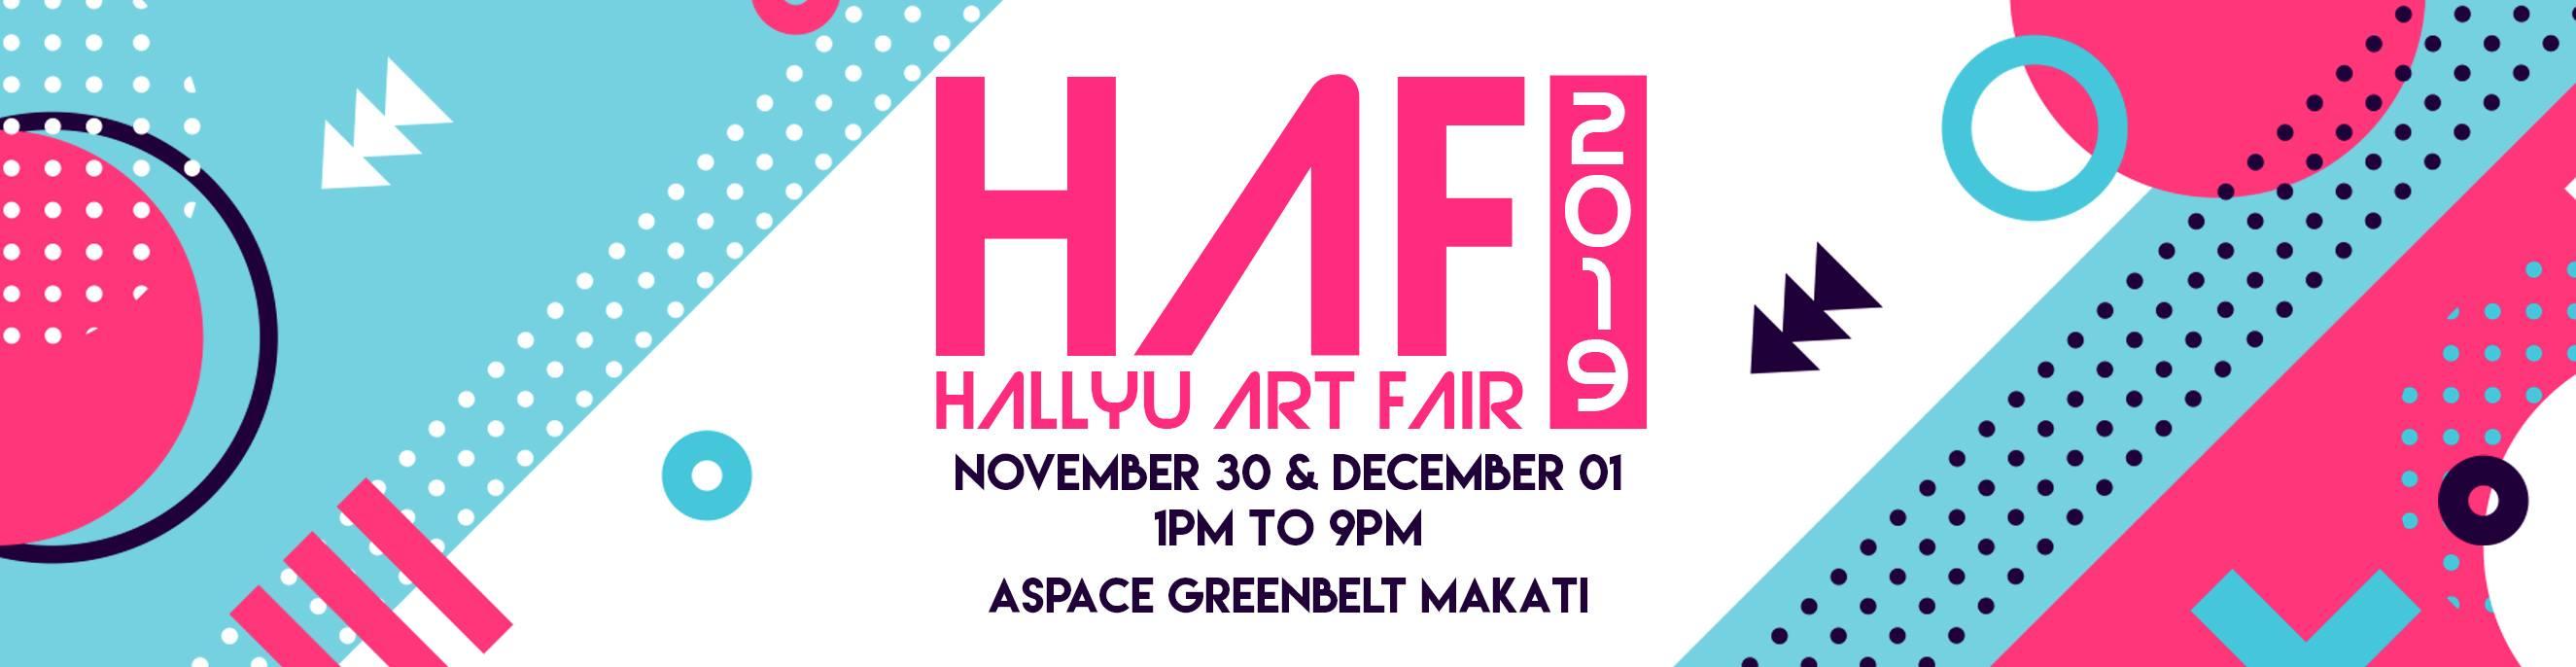 Hallyu Art Fair 2019 by Big Events Management